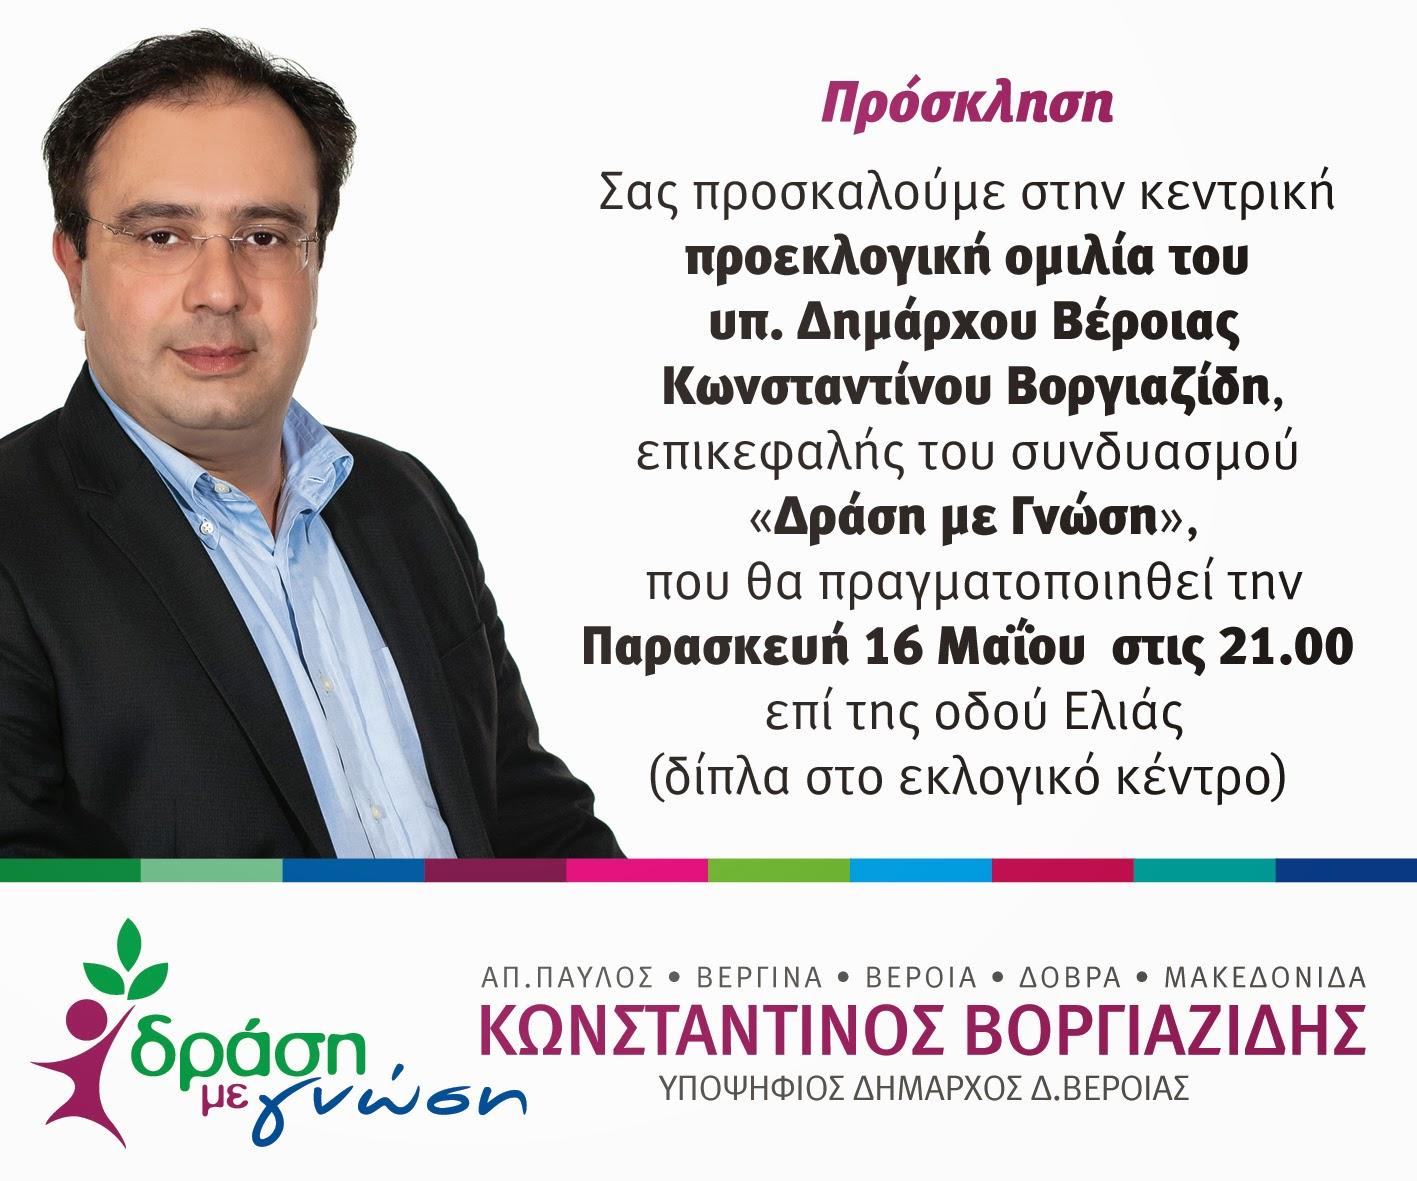 http://www.drasi-gnosi.gr